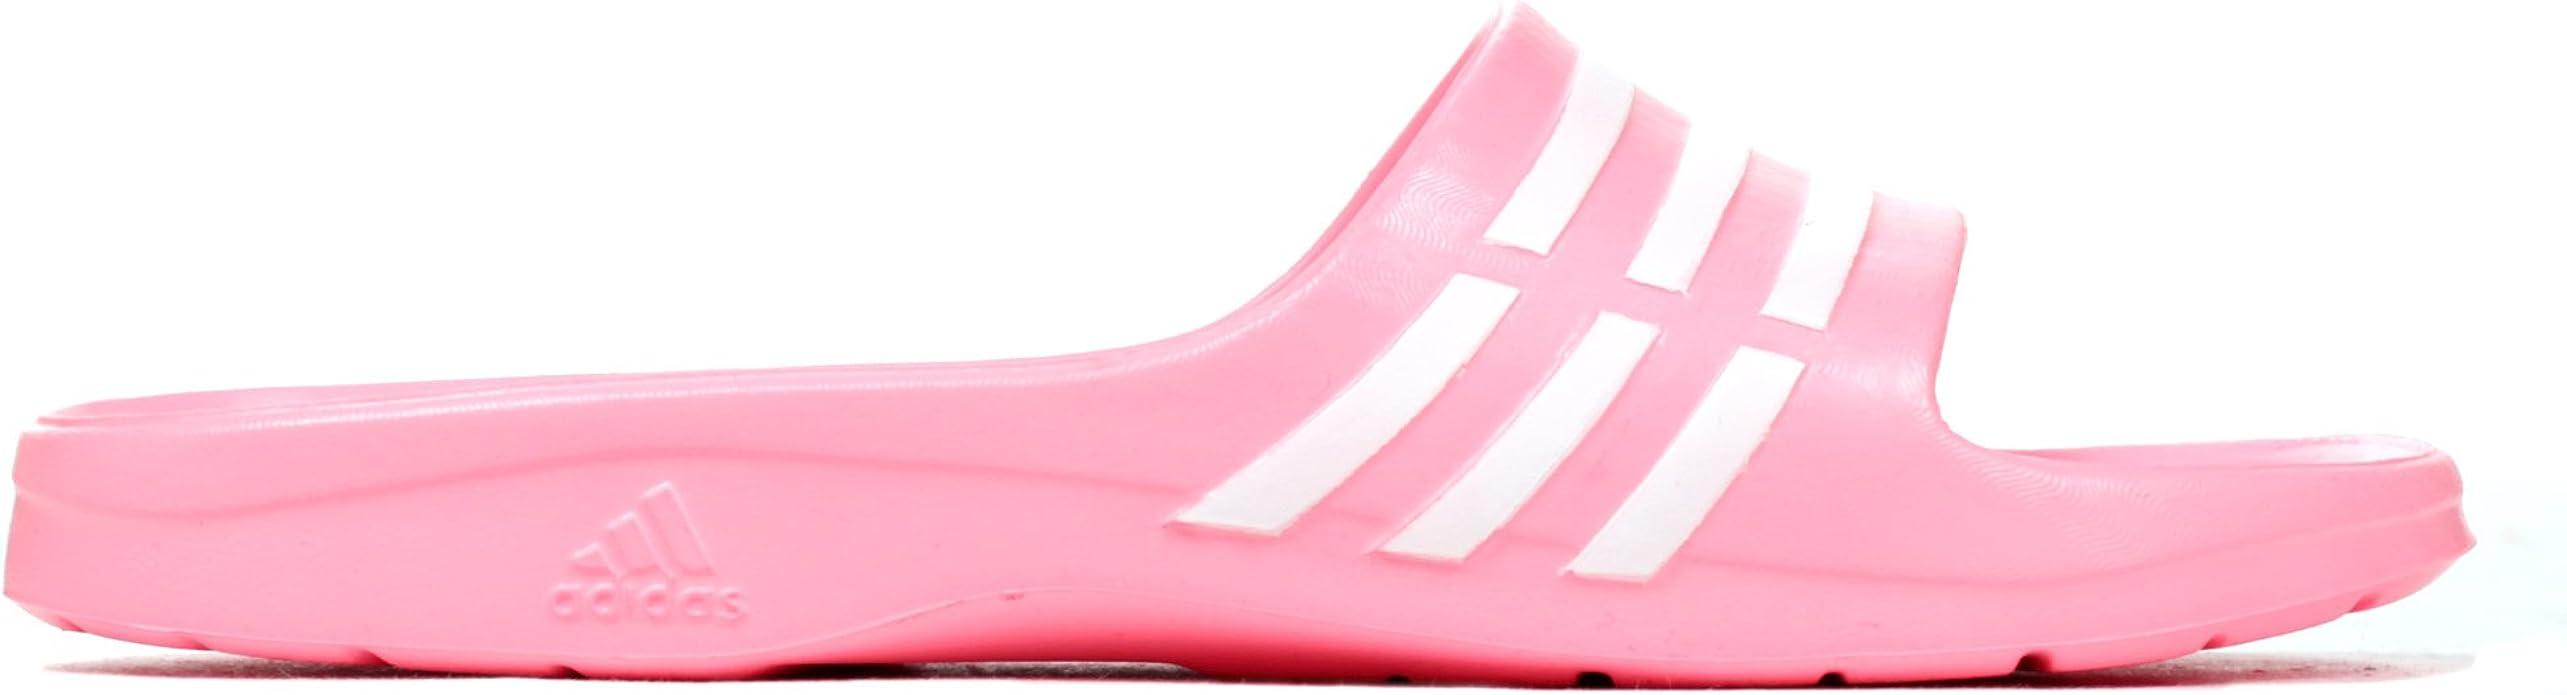 adidas Duramo Sleek Womens Flip Flop